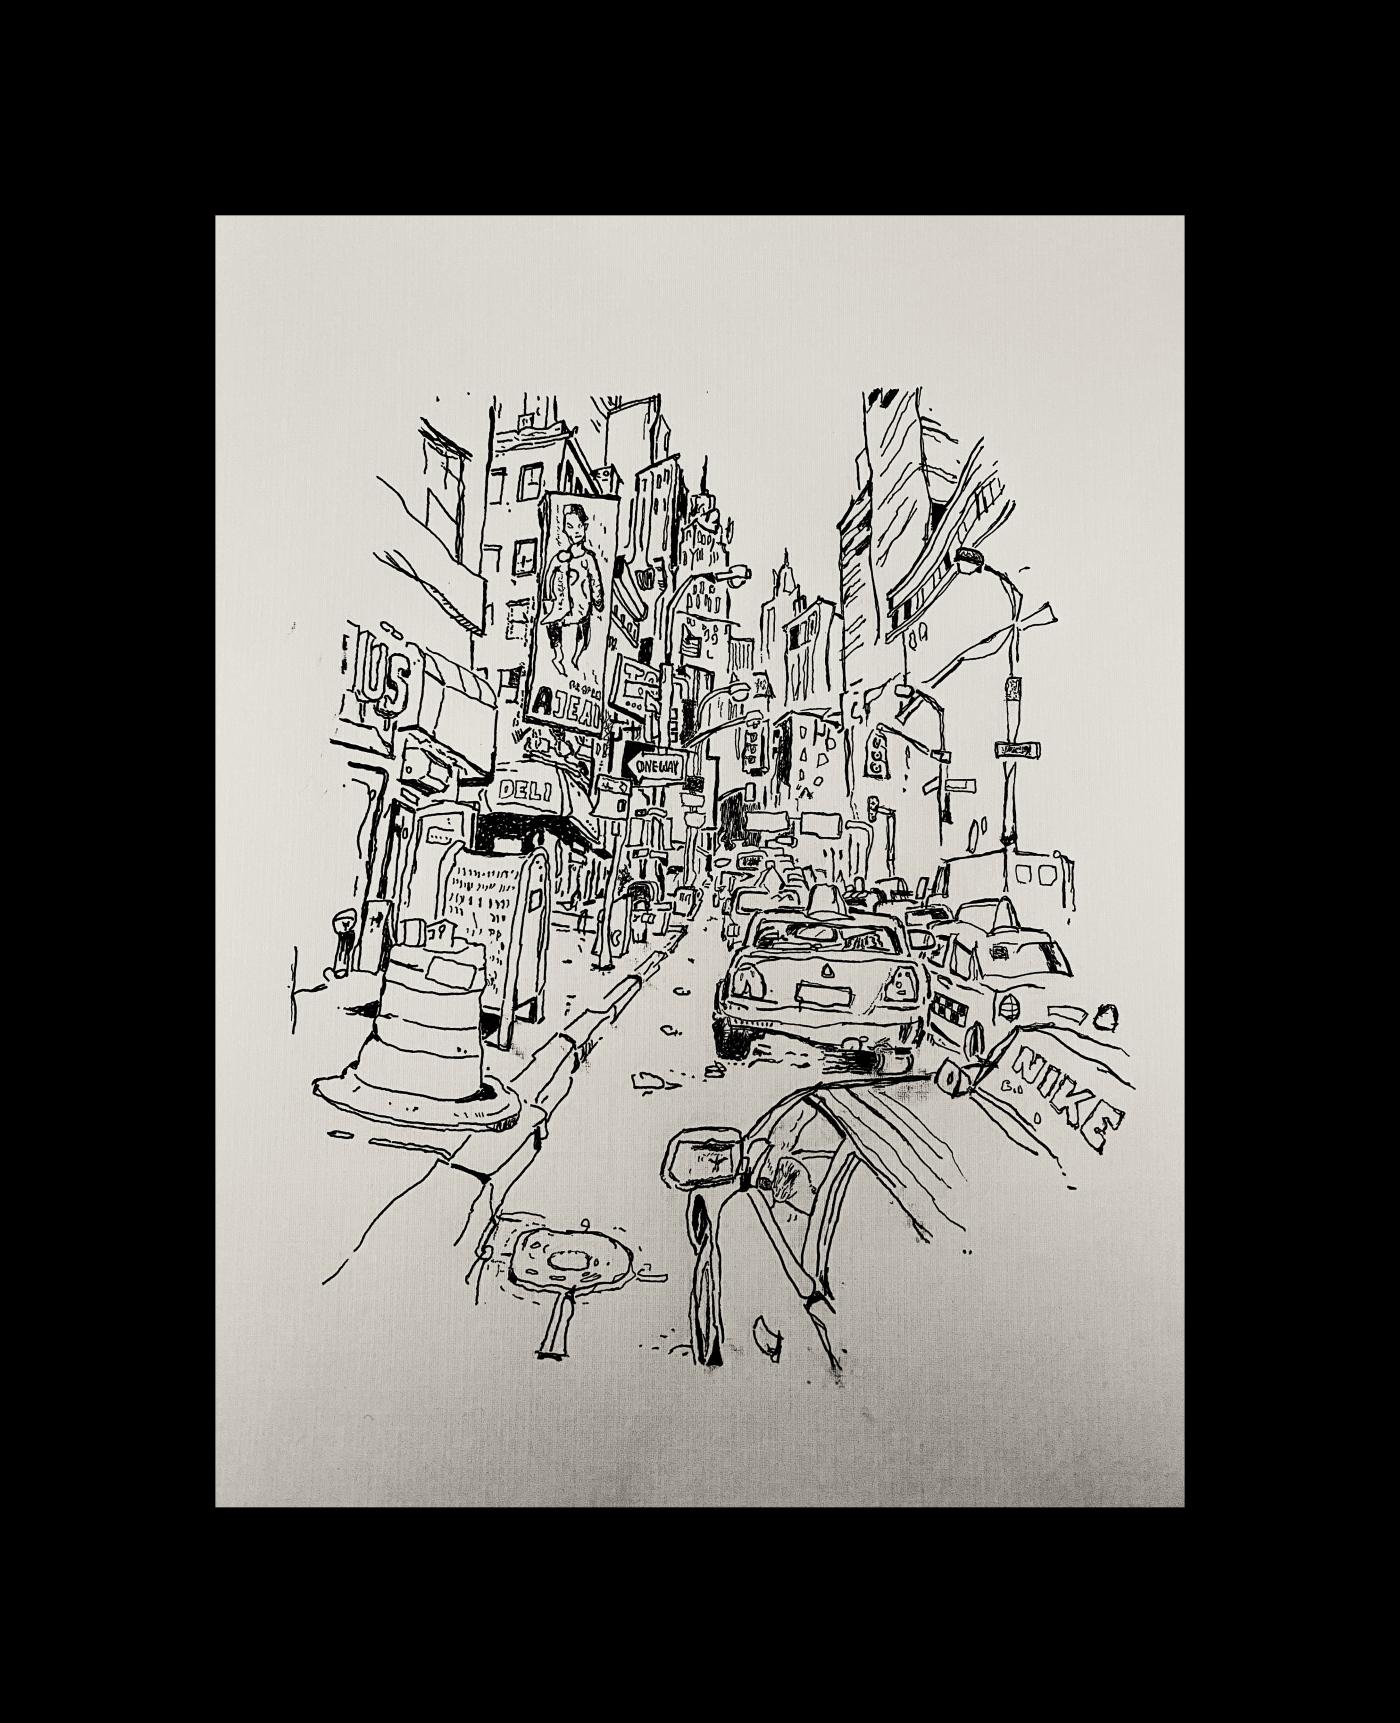 visualizing a vibrant city